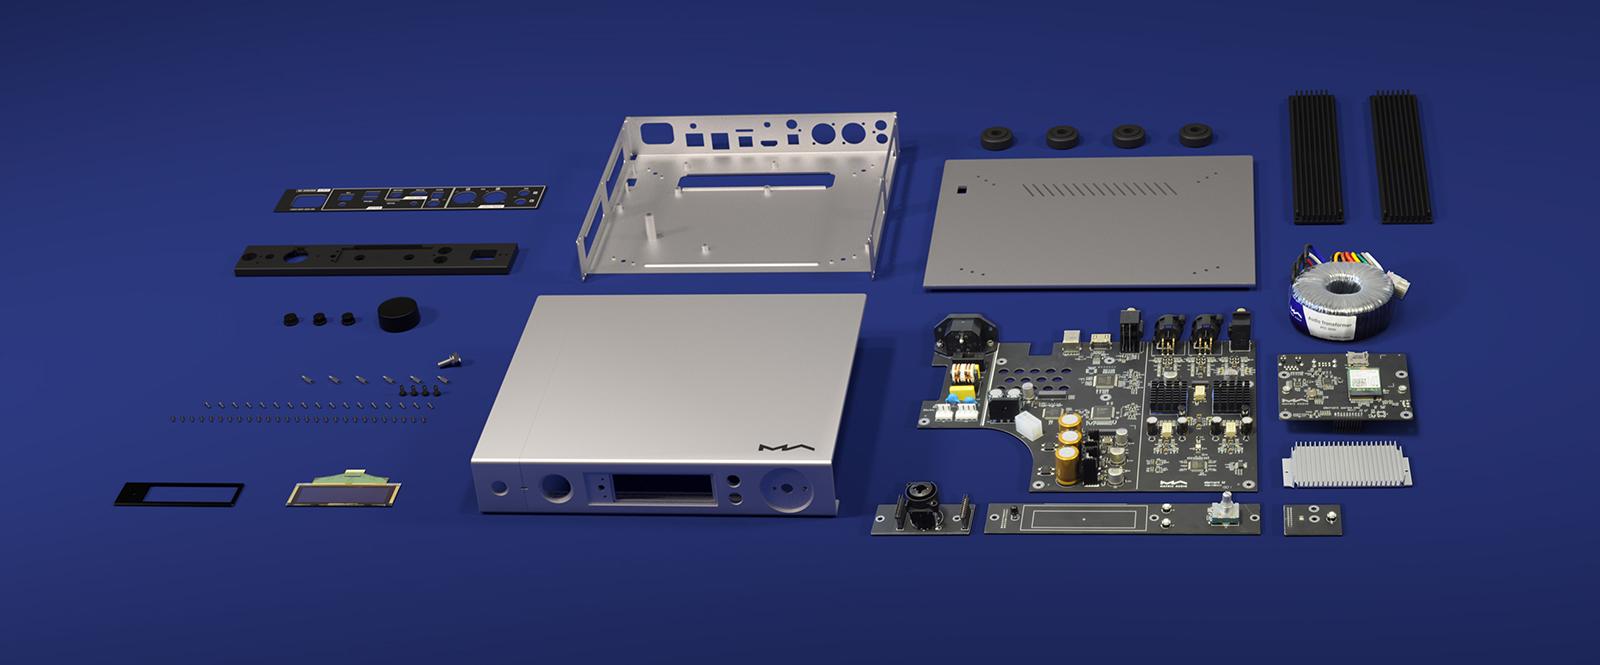 Matrix Audio element M streamer deconstructed